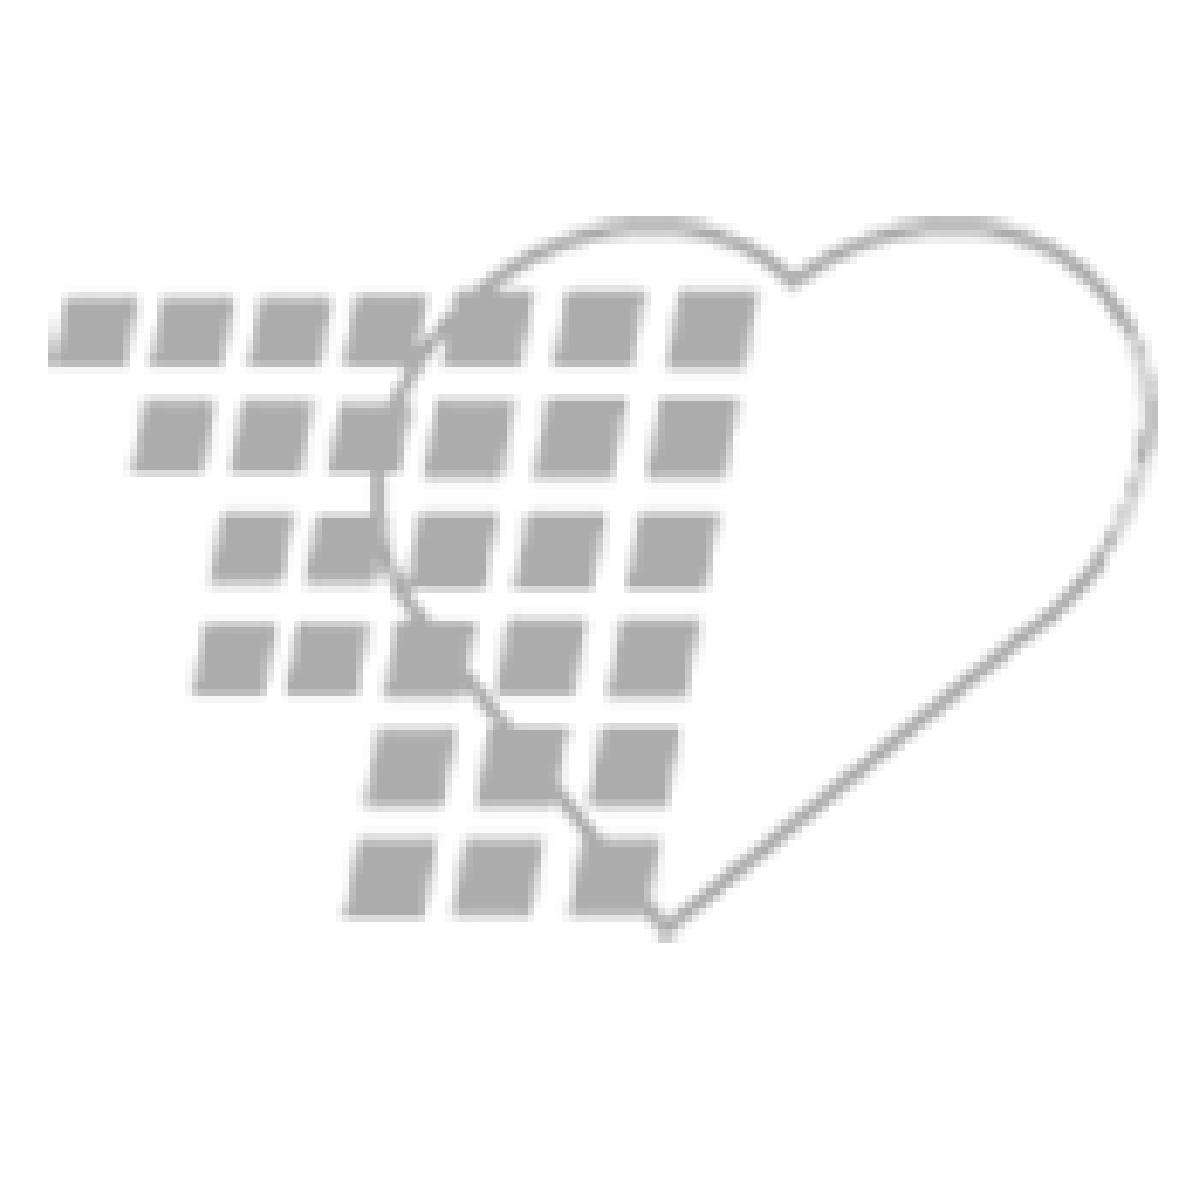 02-44-3031 - Zoll® R-Series Defibrillator